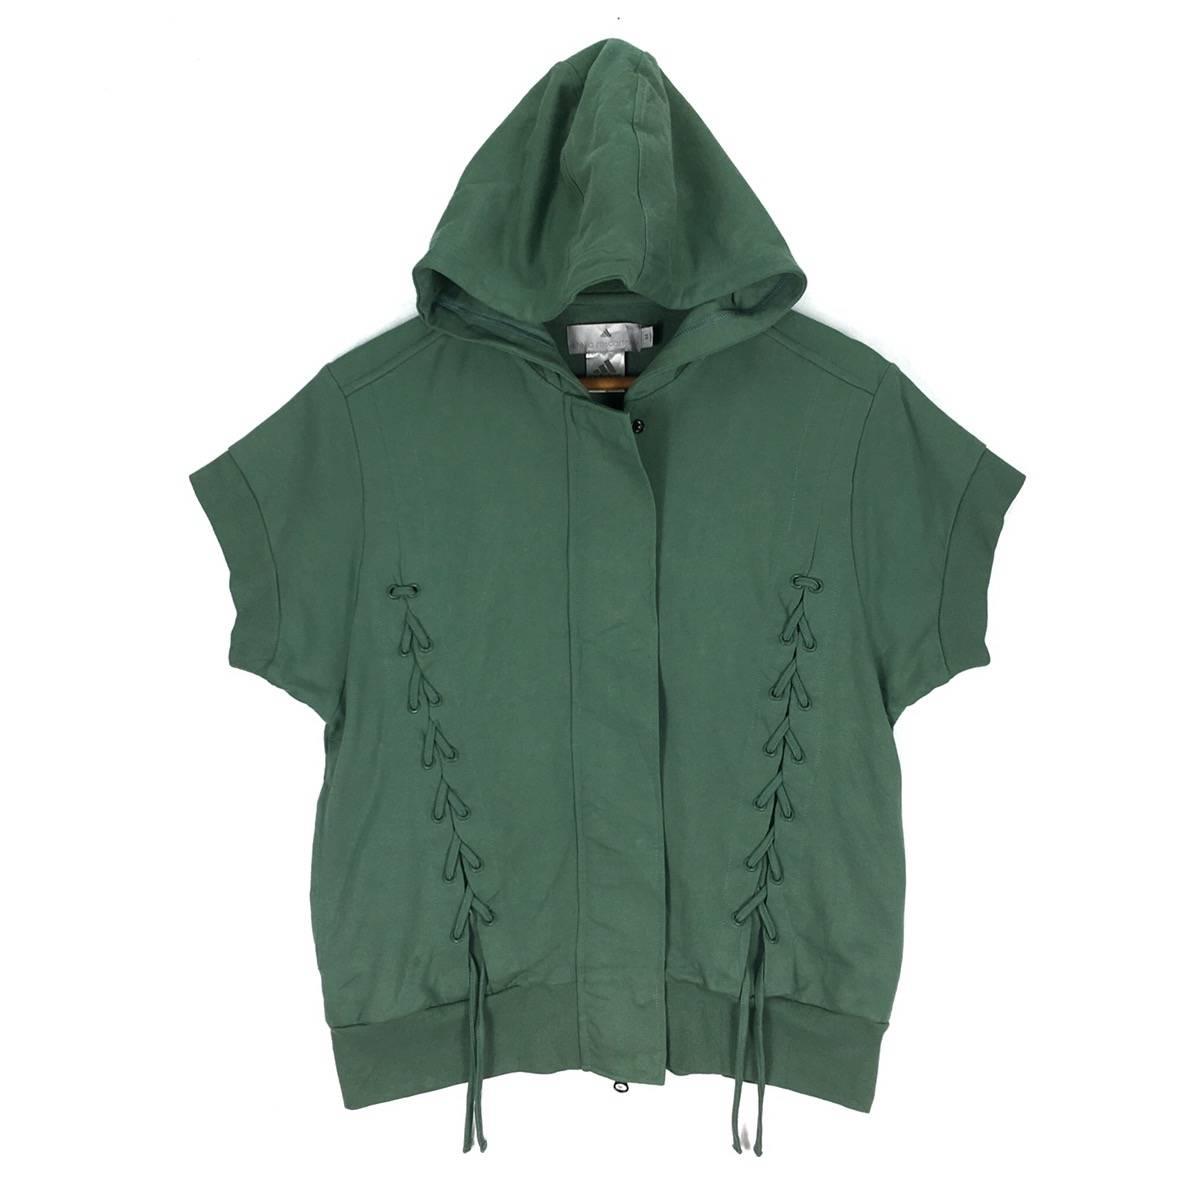 Adidas × Sample Industries × Stella Mccartney Rare!! Stella Mccartney Adidas Sample Not For Resale Hoodie Size M $84